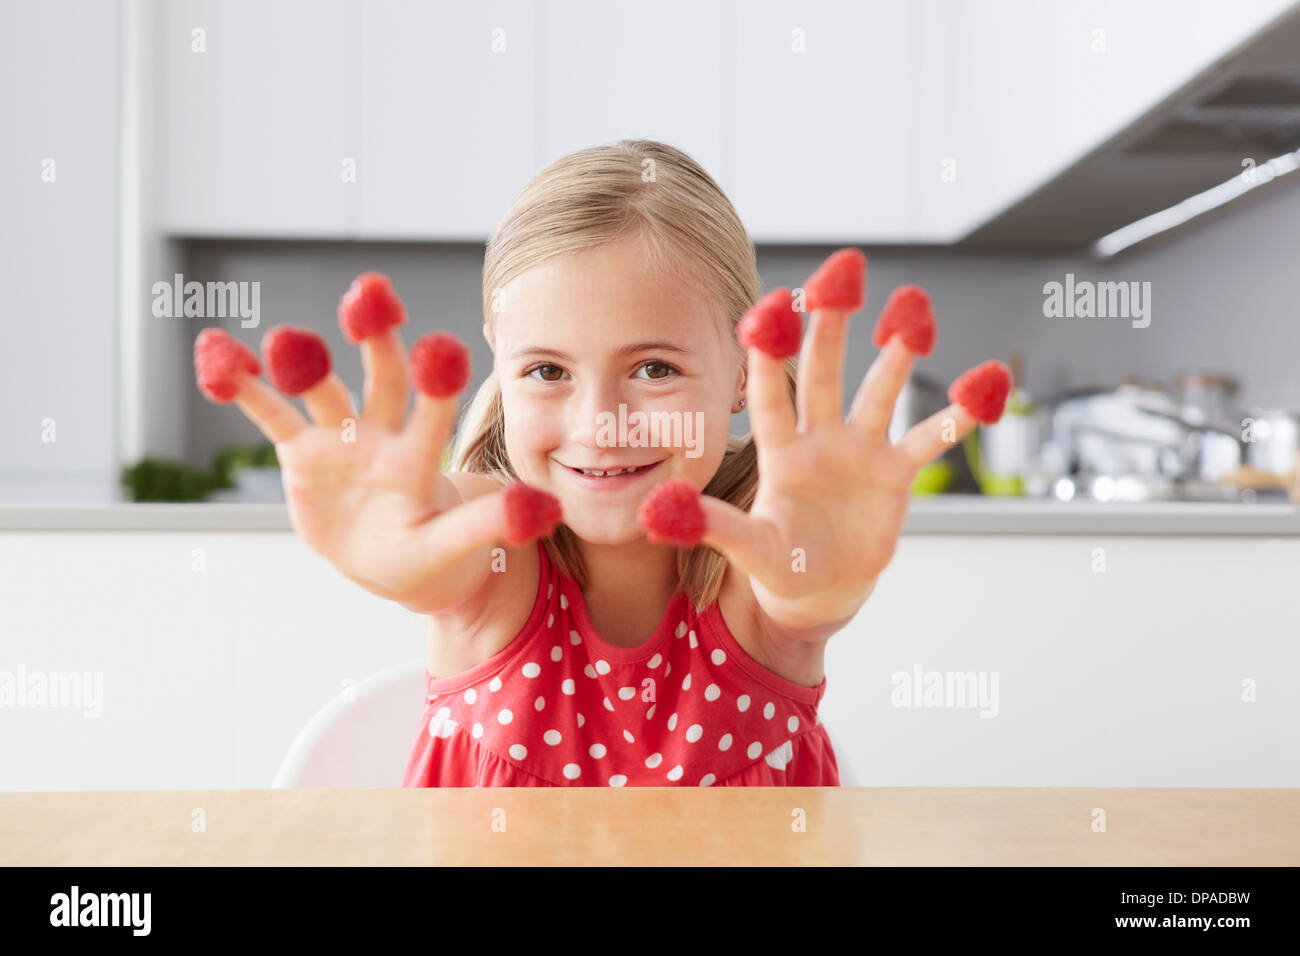 Girl putting raspberries on fingers - Stock Image